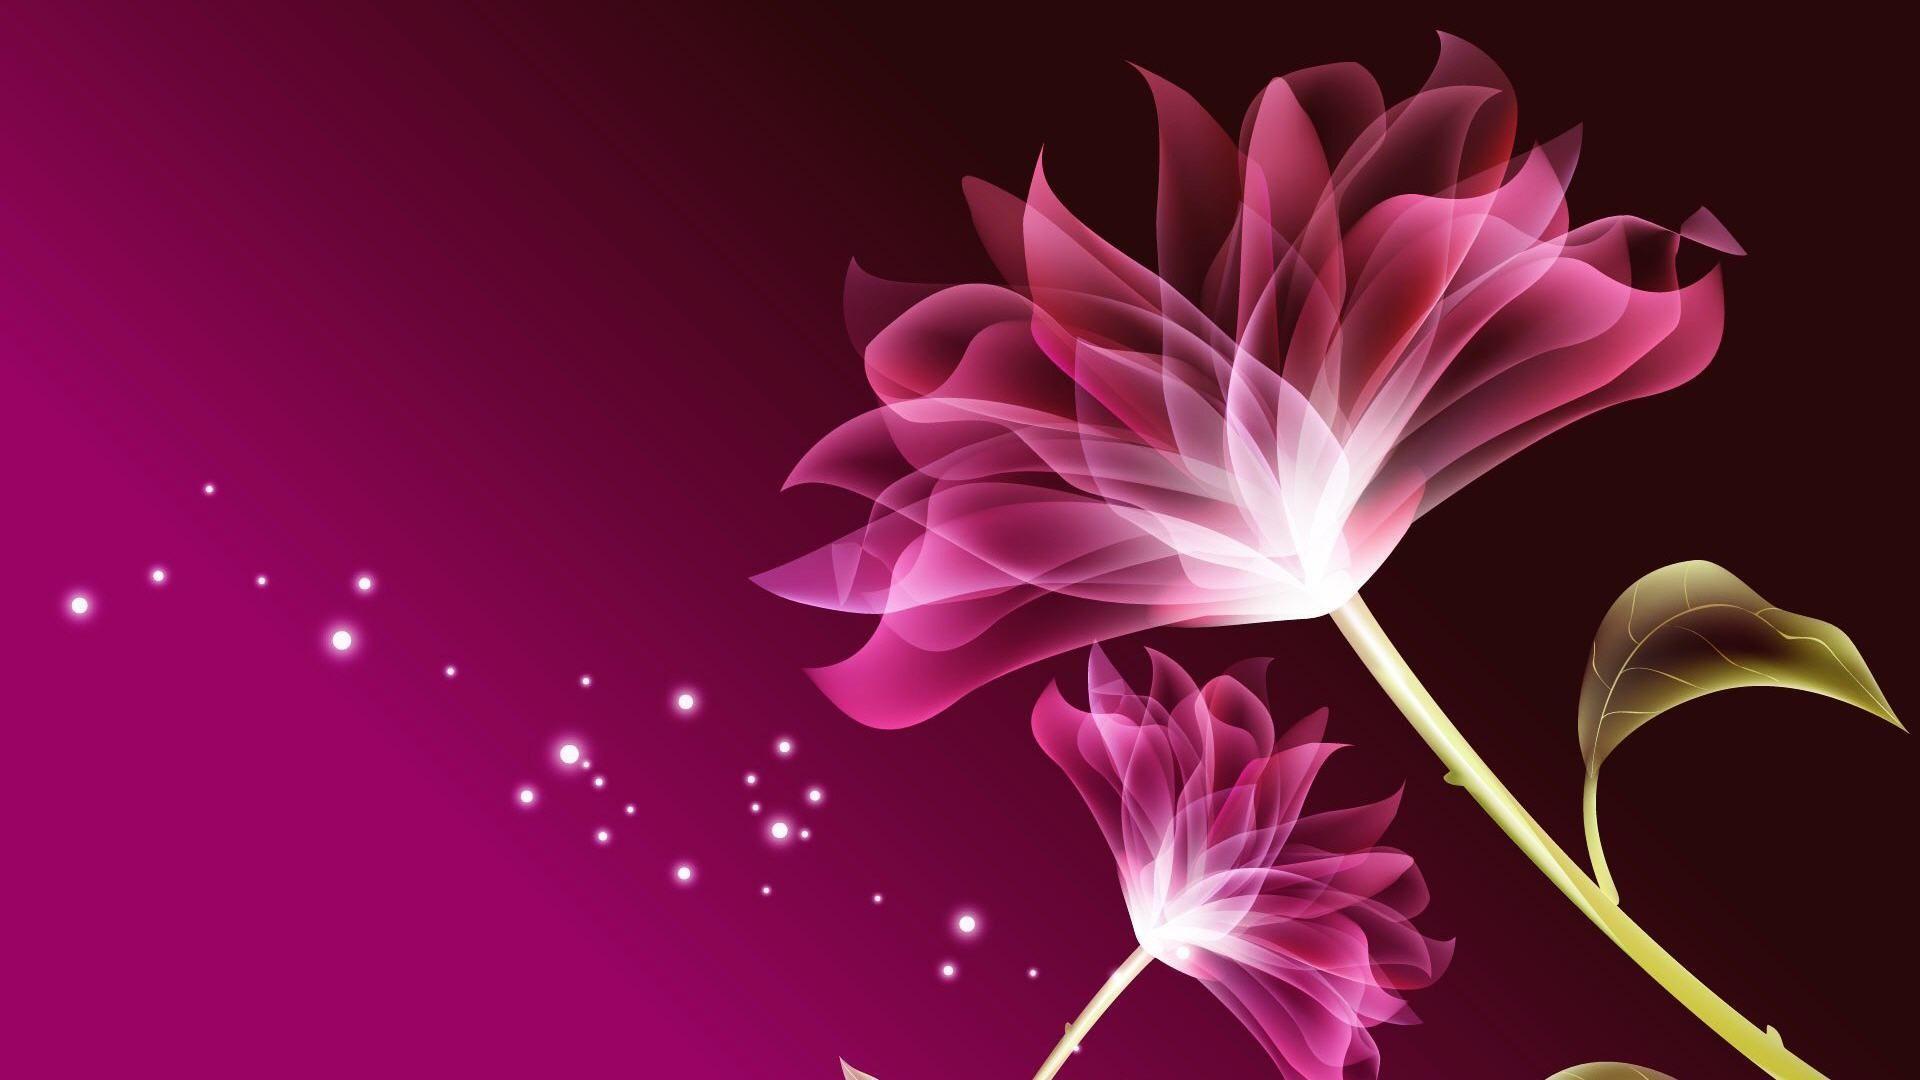 Beautiful Flower Wallpapers Desktop Wallpaper Cave